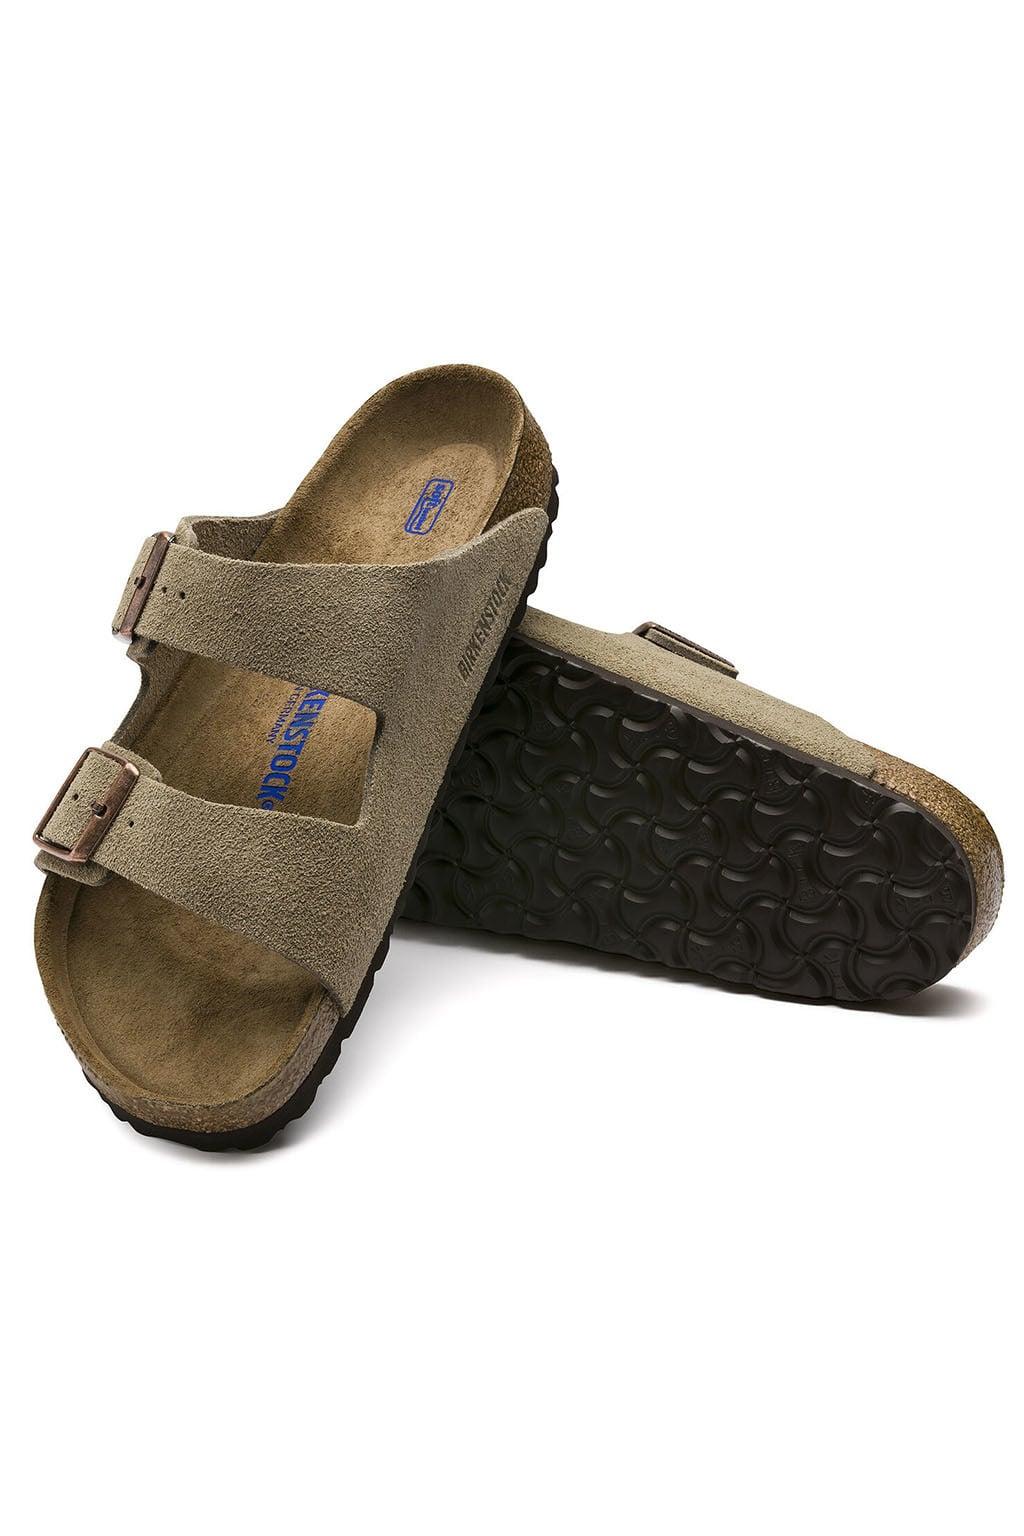 Birkenstock arizona sandalen smal taupe 36 Birkenstock arizona sandalen smal taupe